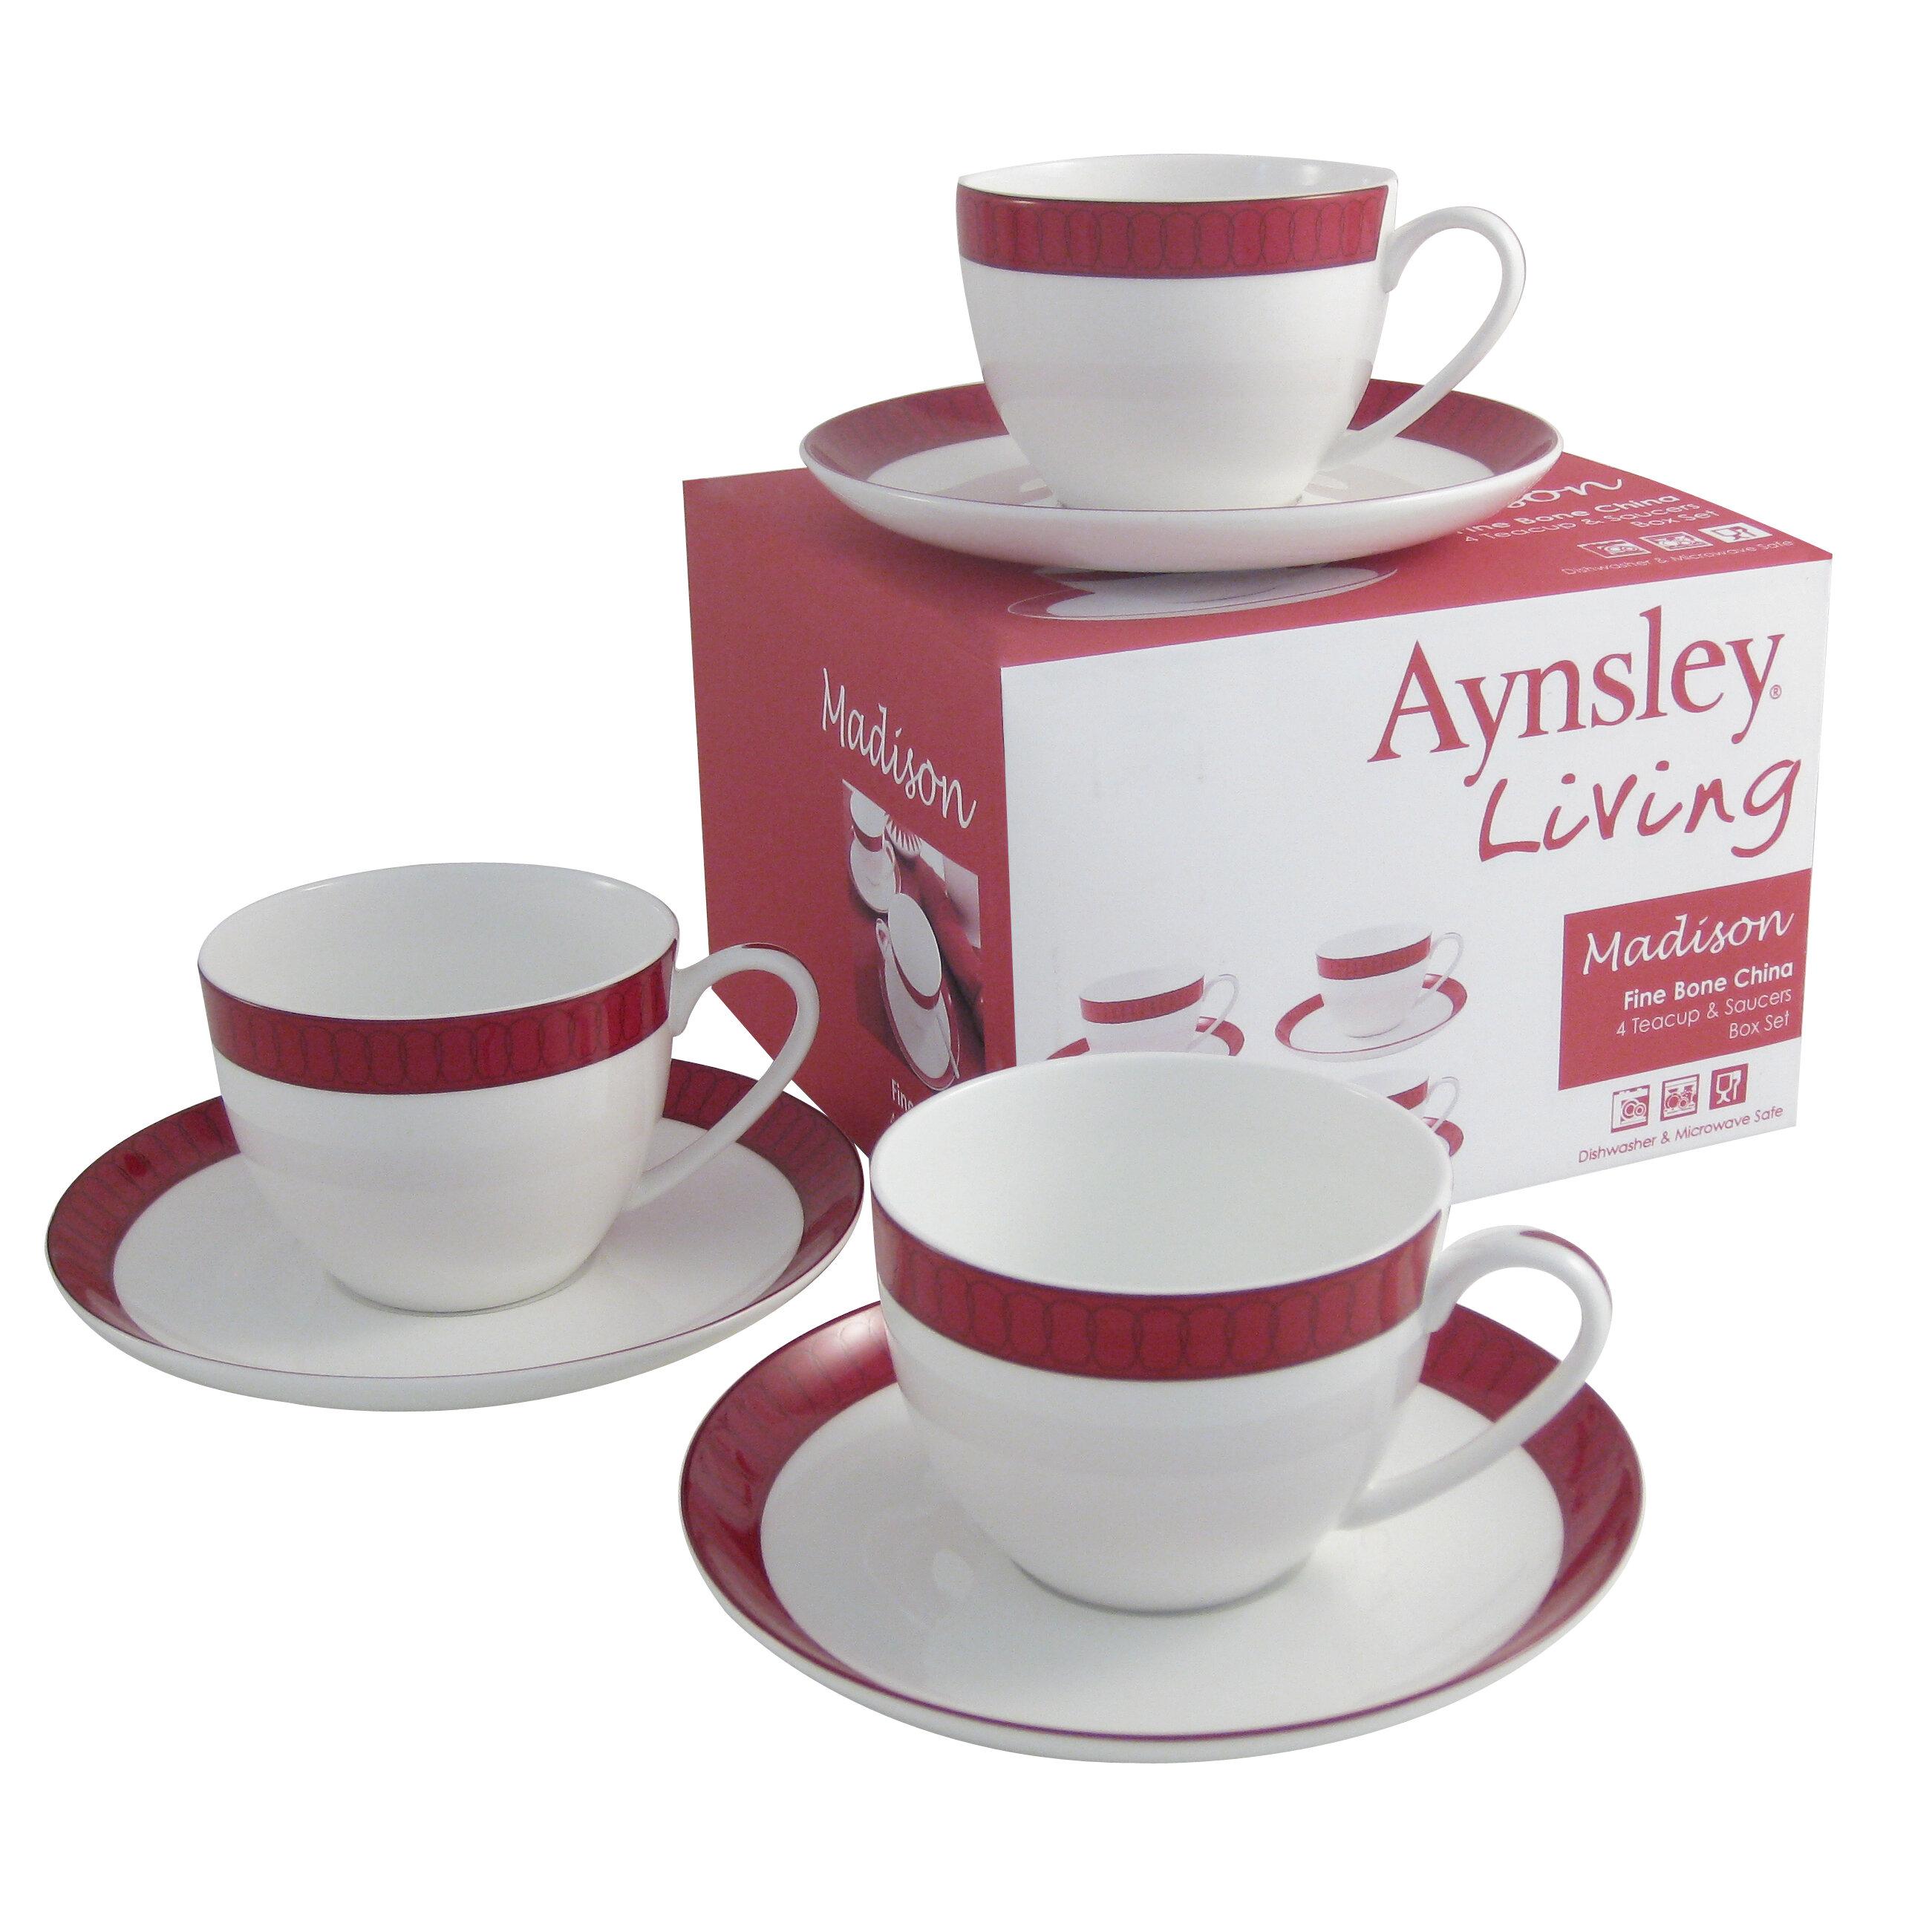 Madison Teacup and Saucer Set (Set of 4). by Aynsley China  sc 1 st  Wayfair & Aynsley China | Wayfair.co.uk